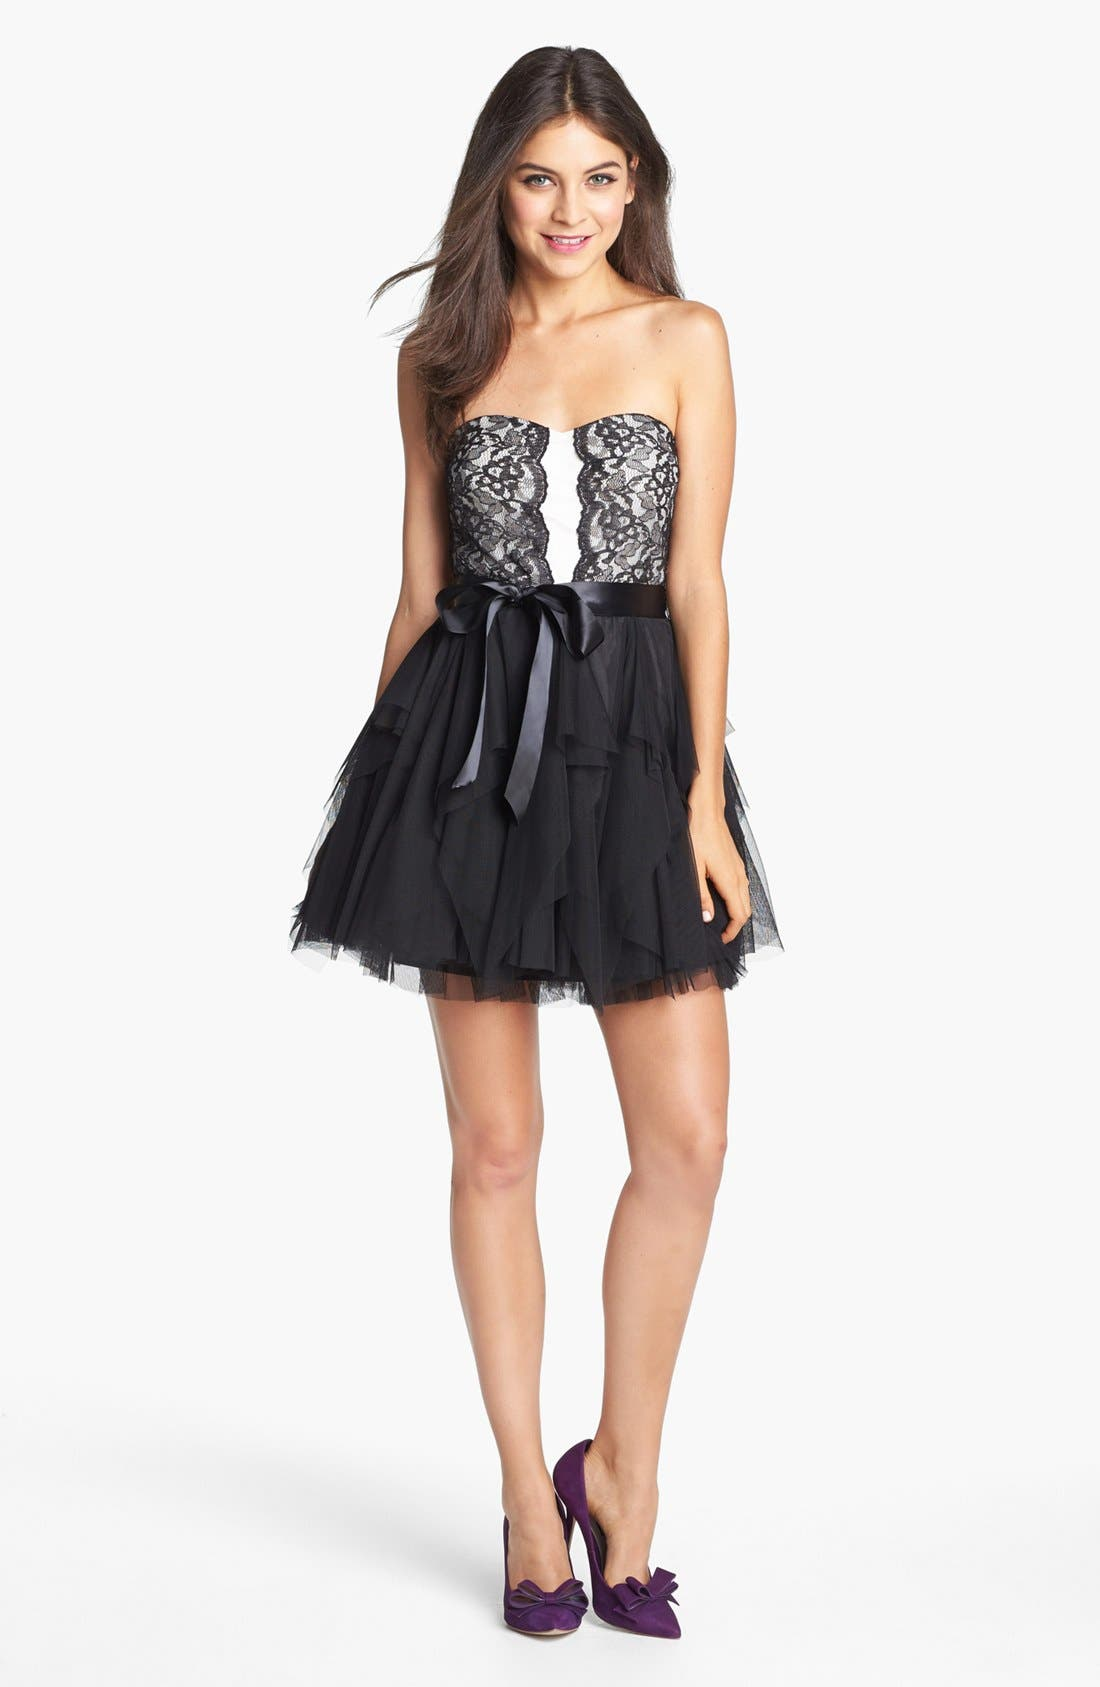 Alternate Image 1 Selected - Secret Charm Lace Fit & Flare Dress (Juniors) (Online Only)